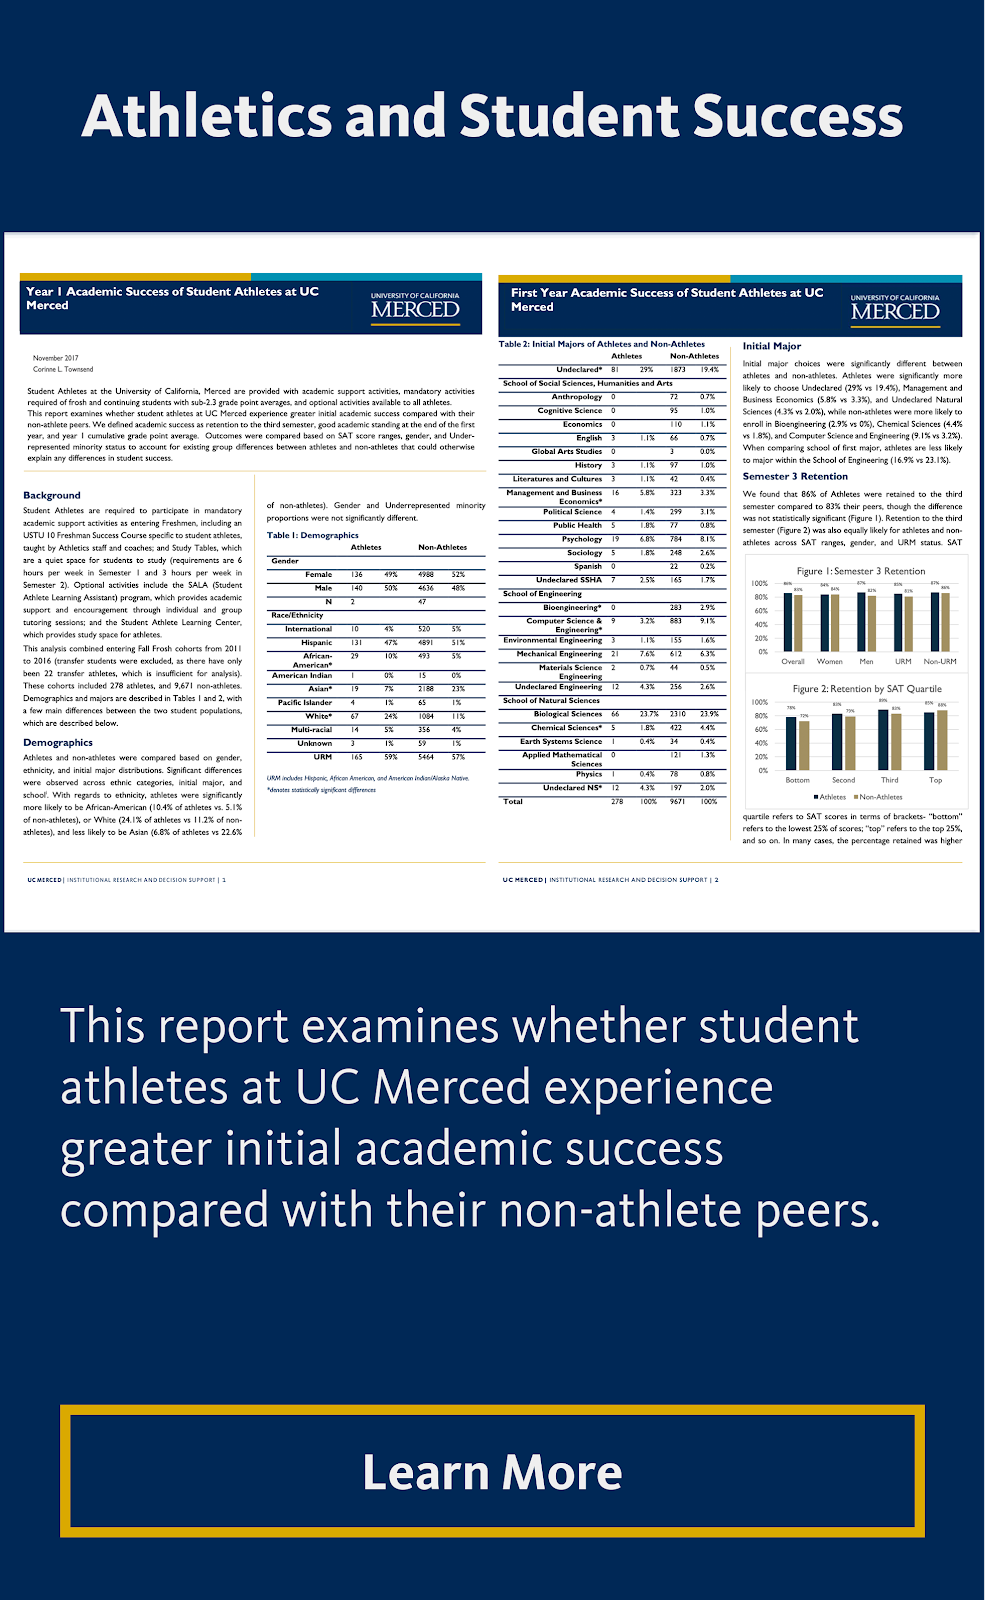 Athletics and Student Success